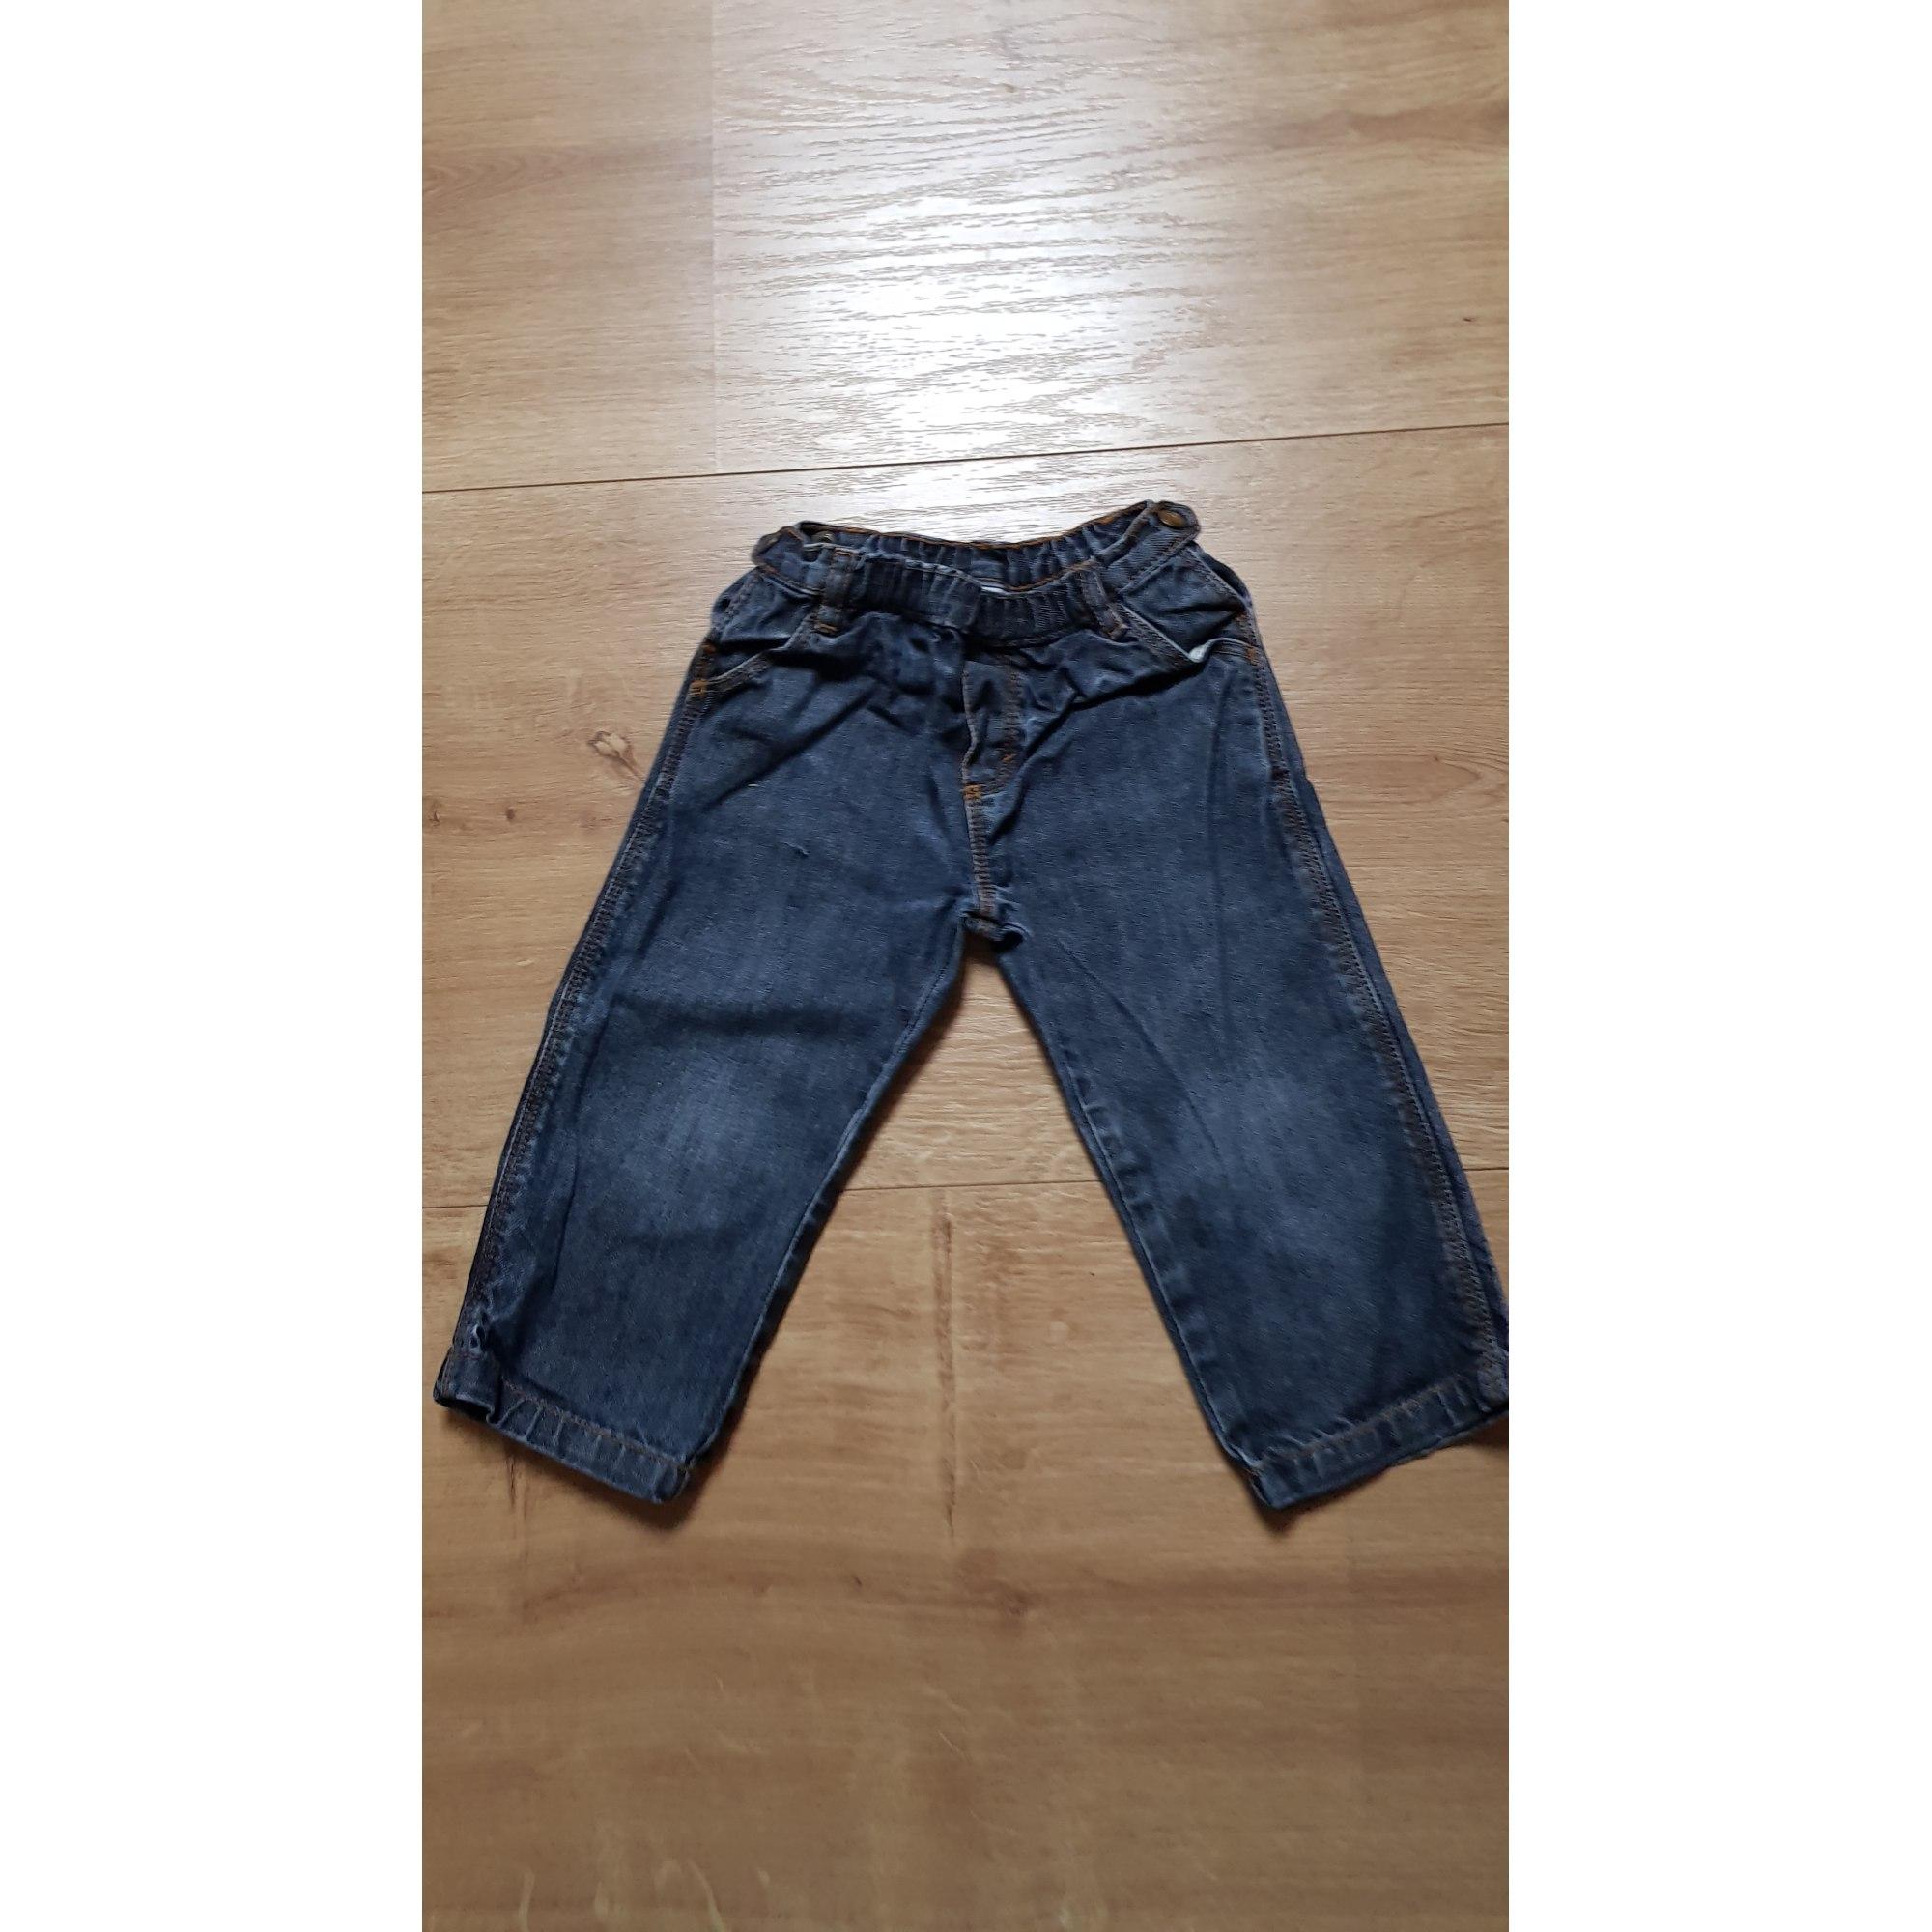 Pantalon PETIT BATEAU Bleu, bleu marine, bleu turquoise